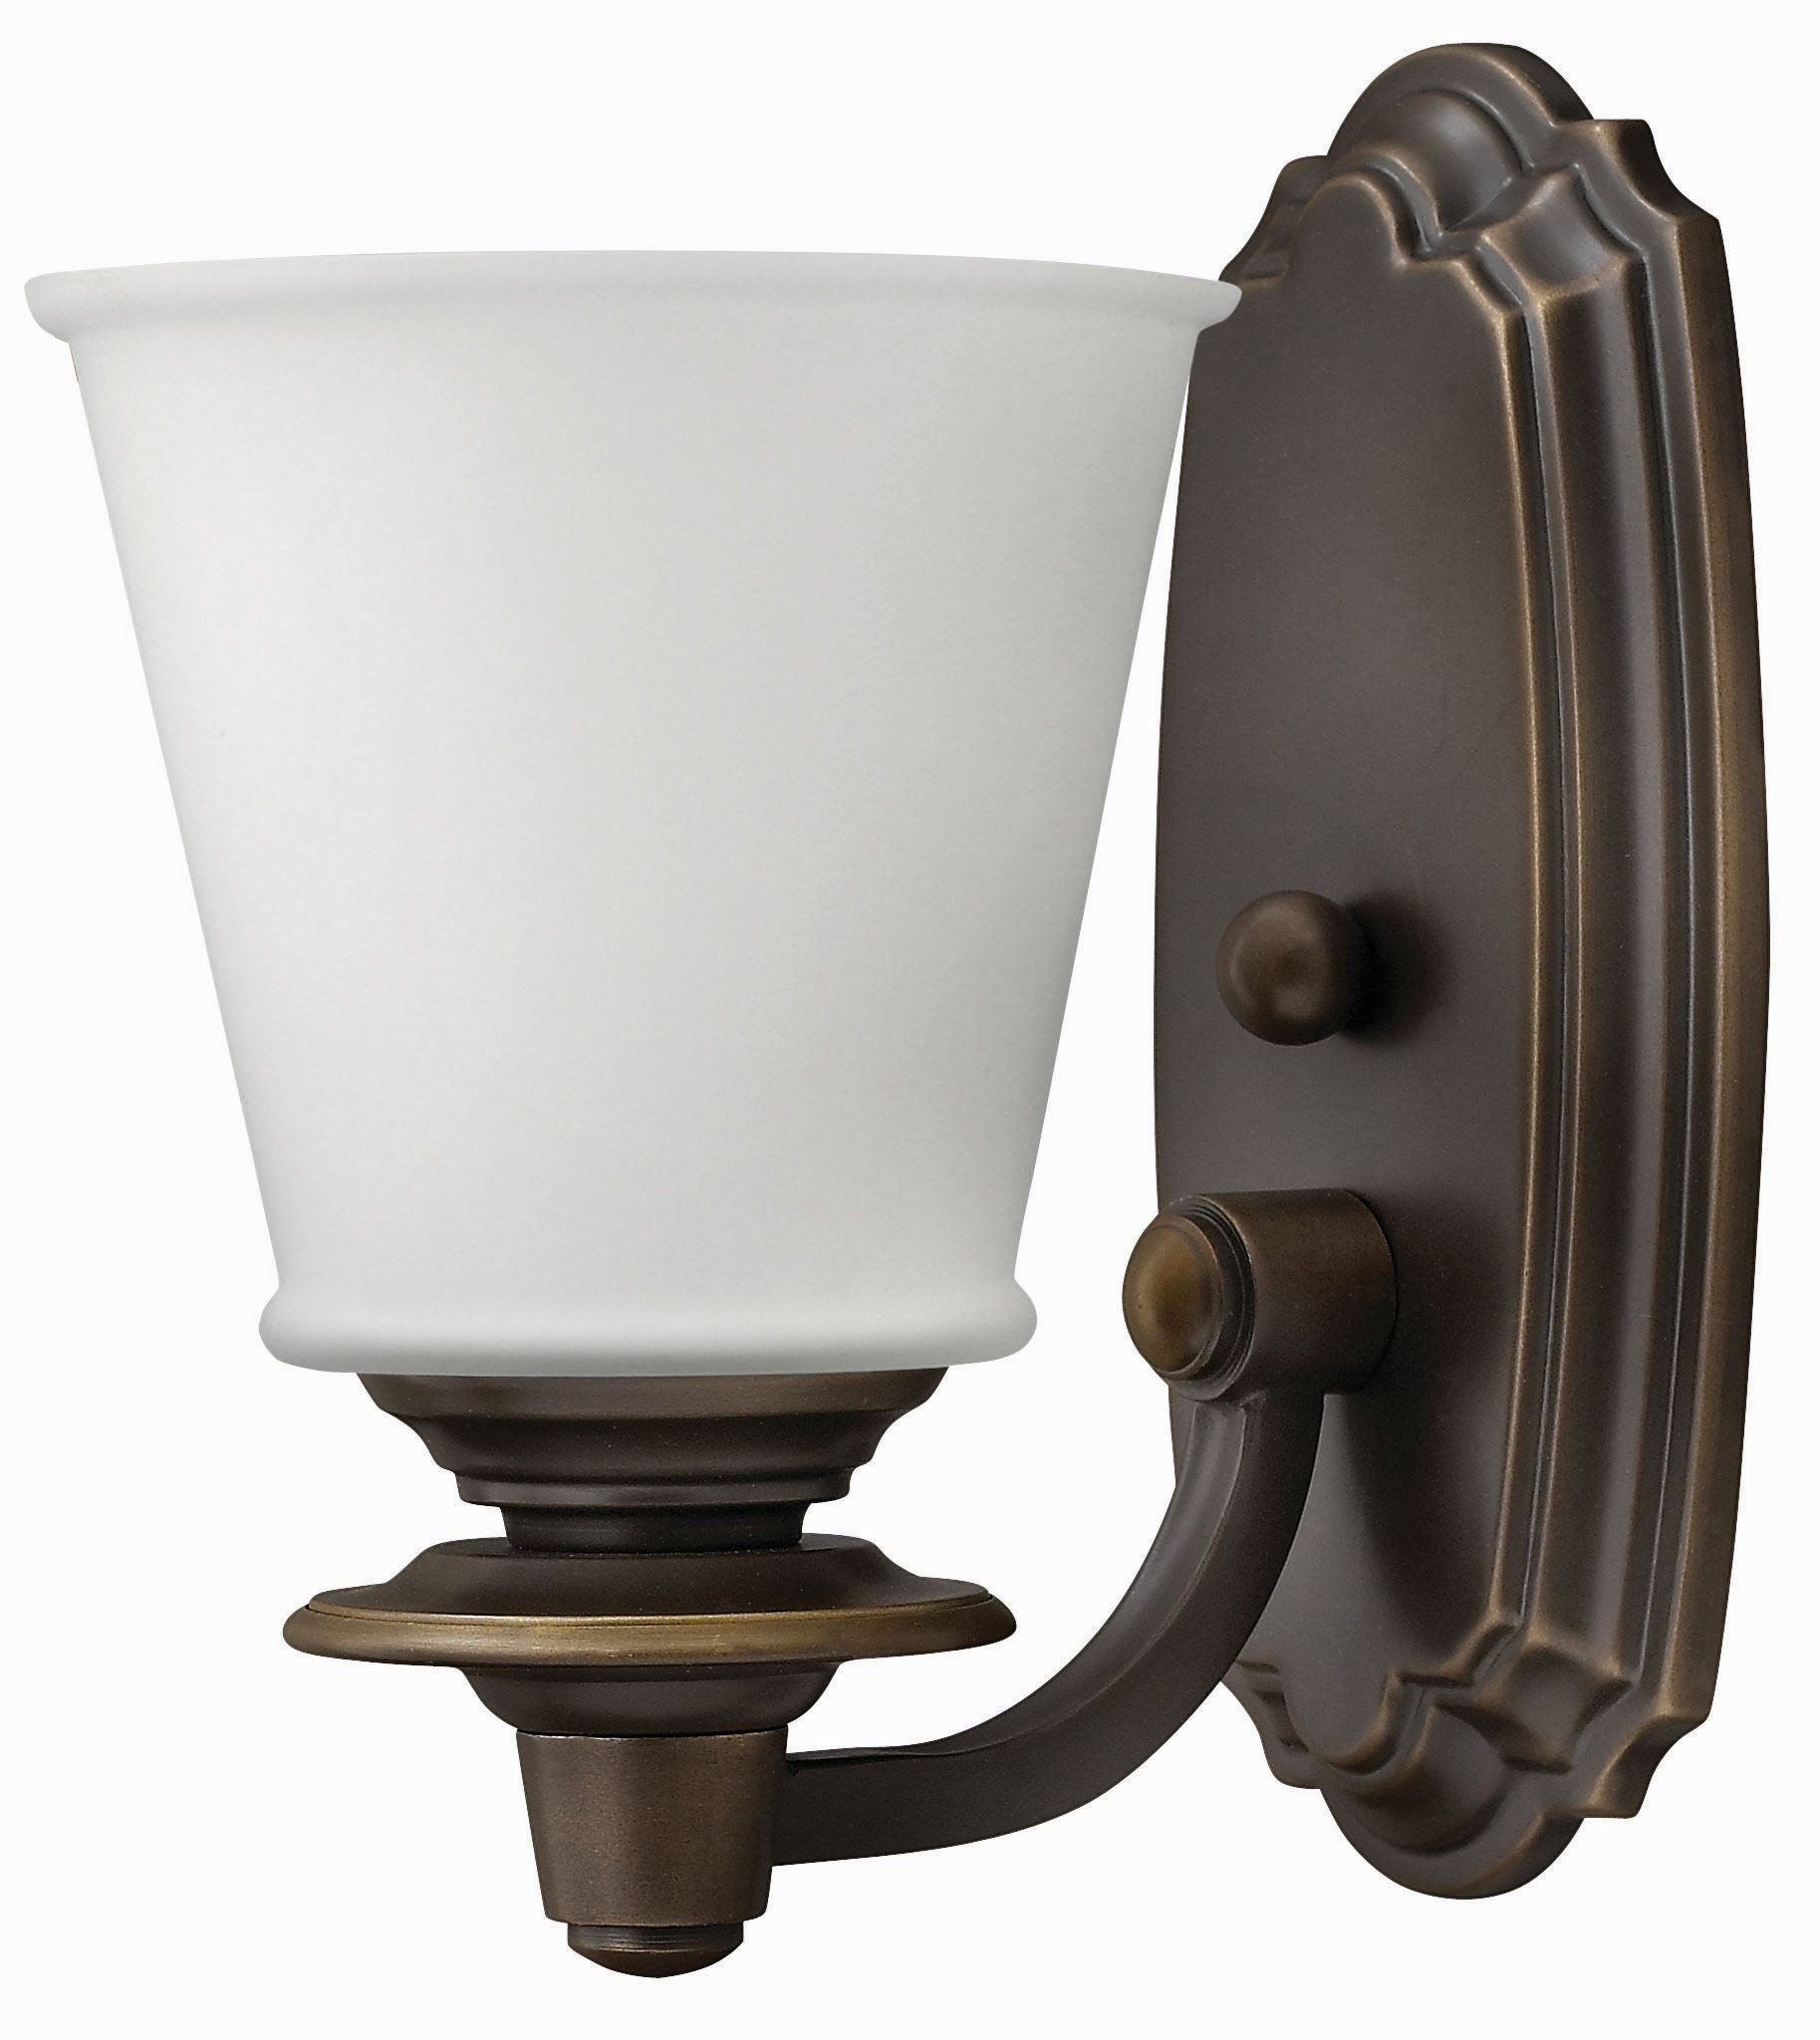 Hinkley Lighting 5426p Plymouth